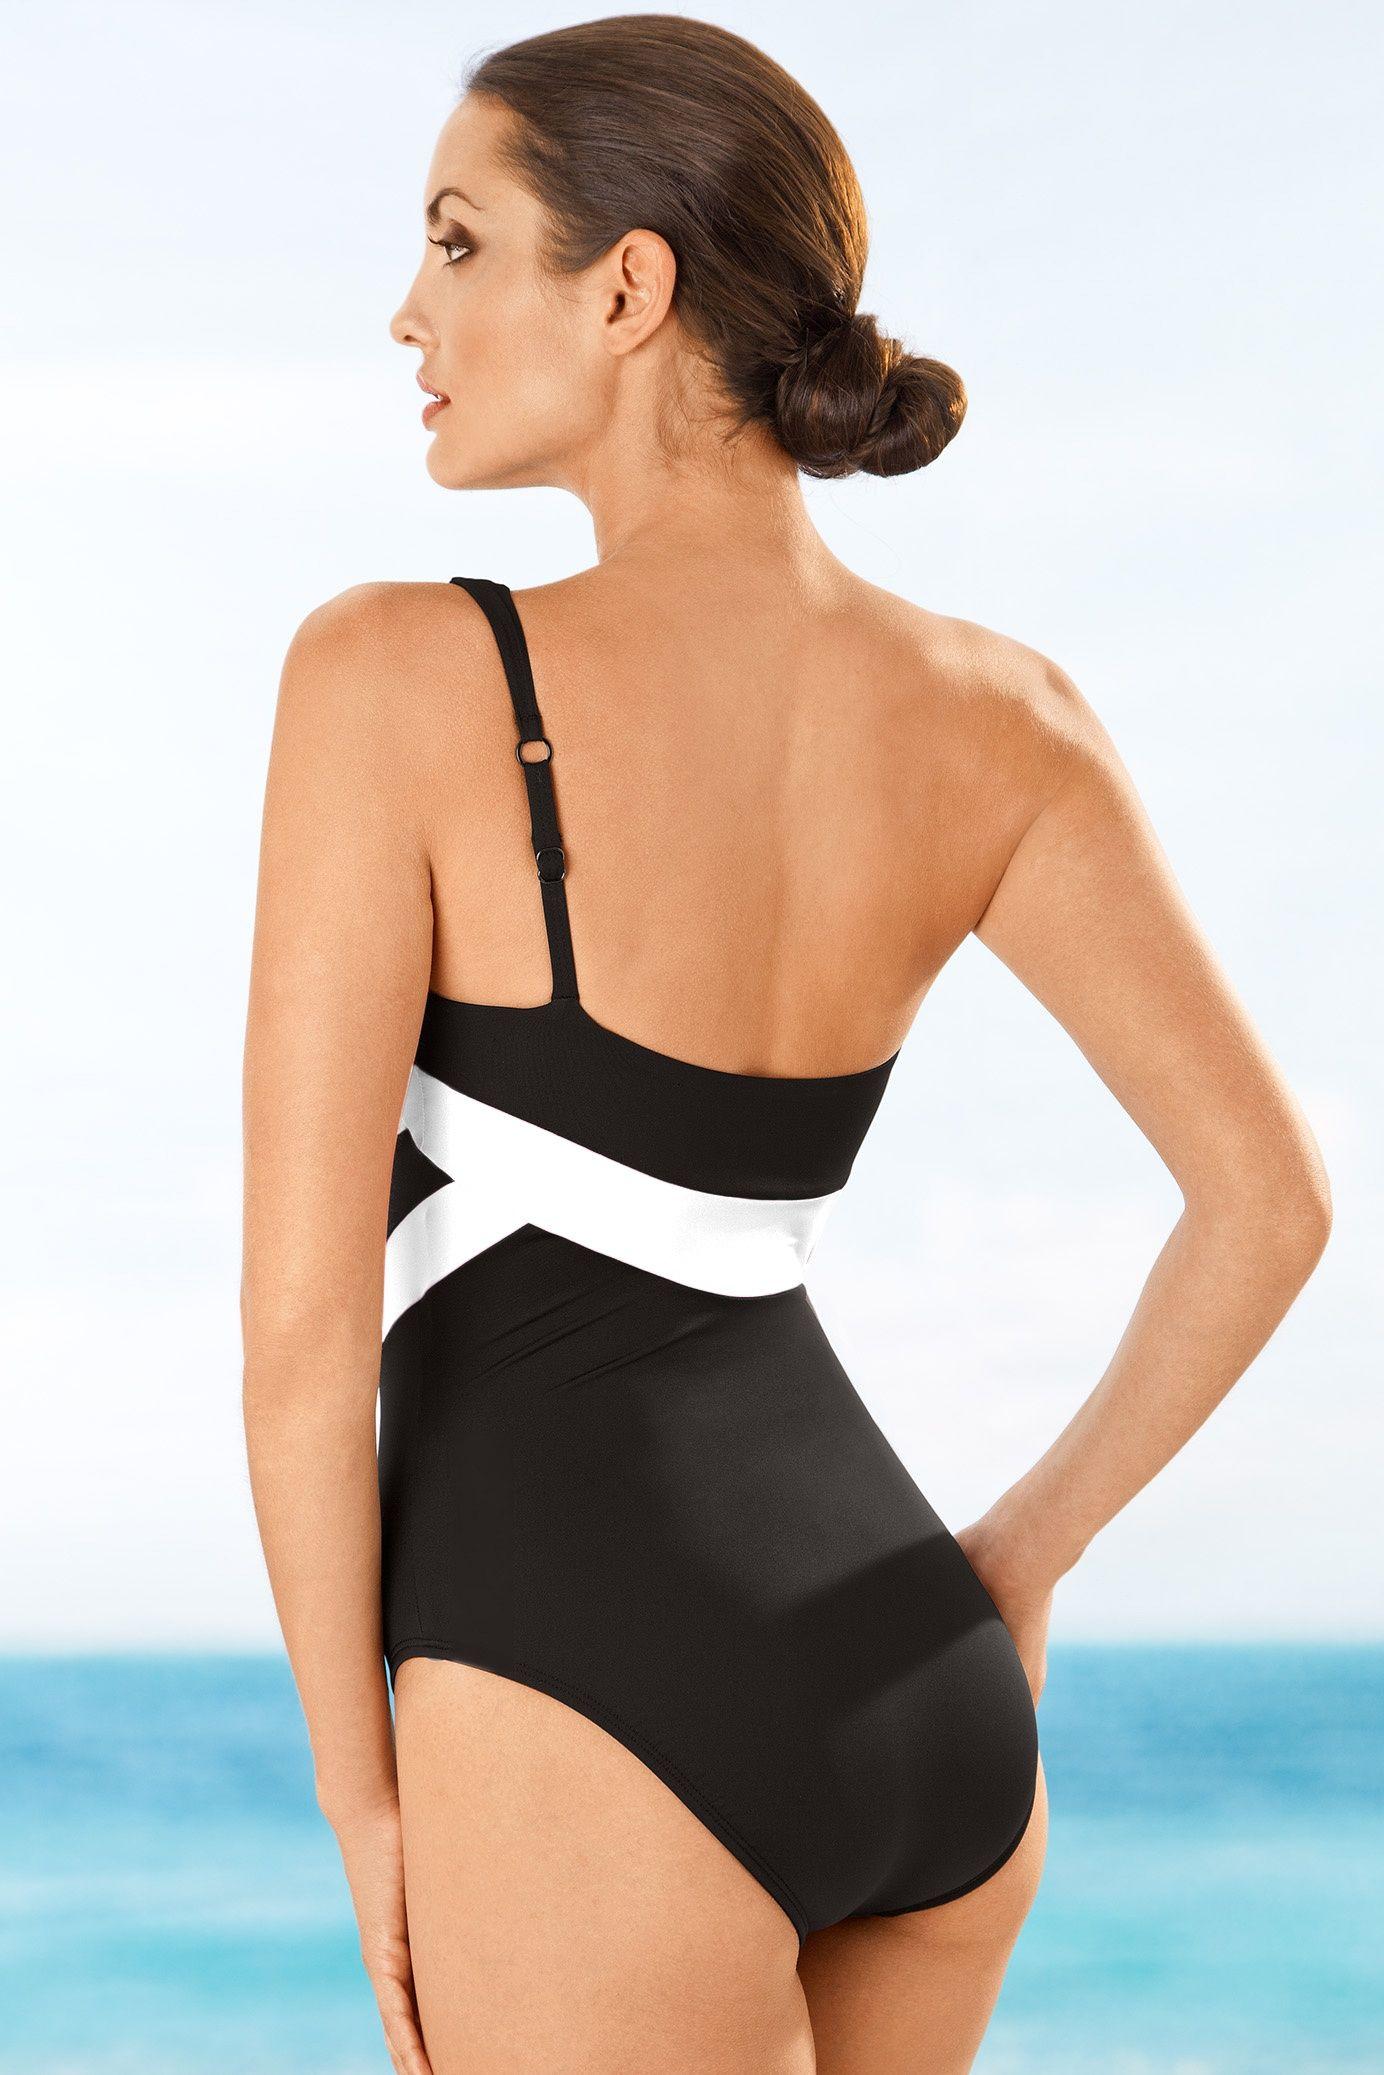 2b74c51da9 Shop Women s Swimwear and Activewear - Boston Proper